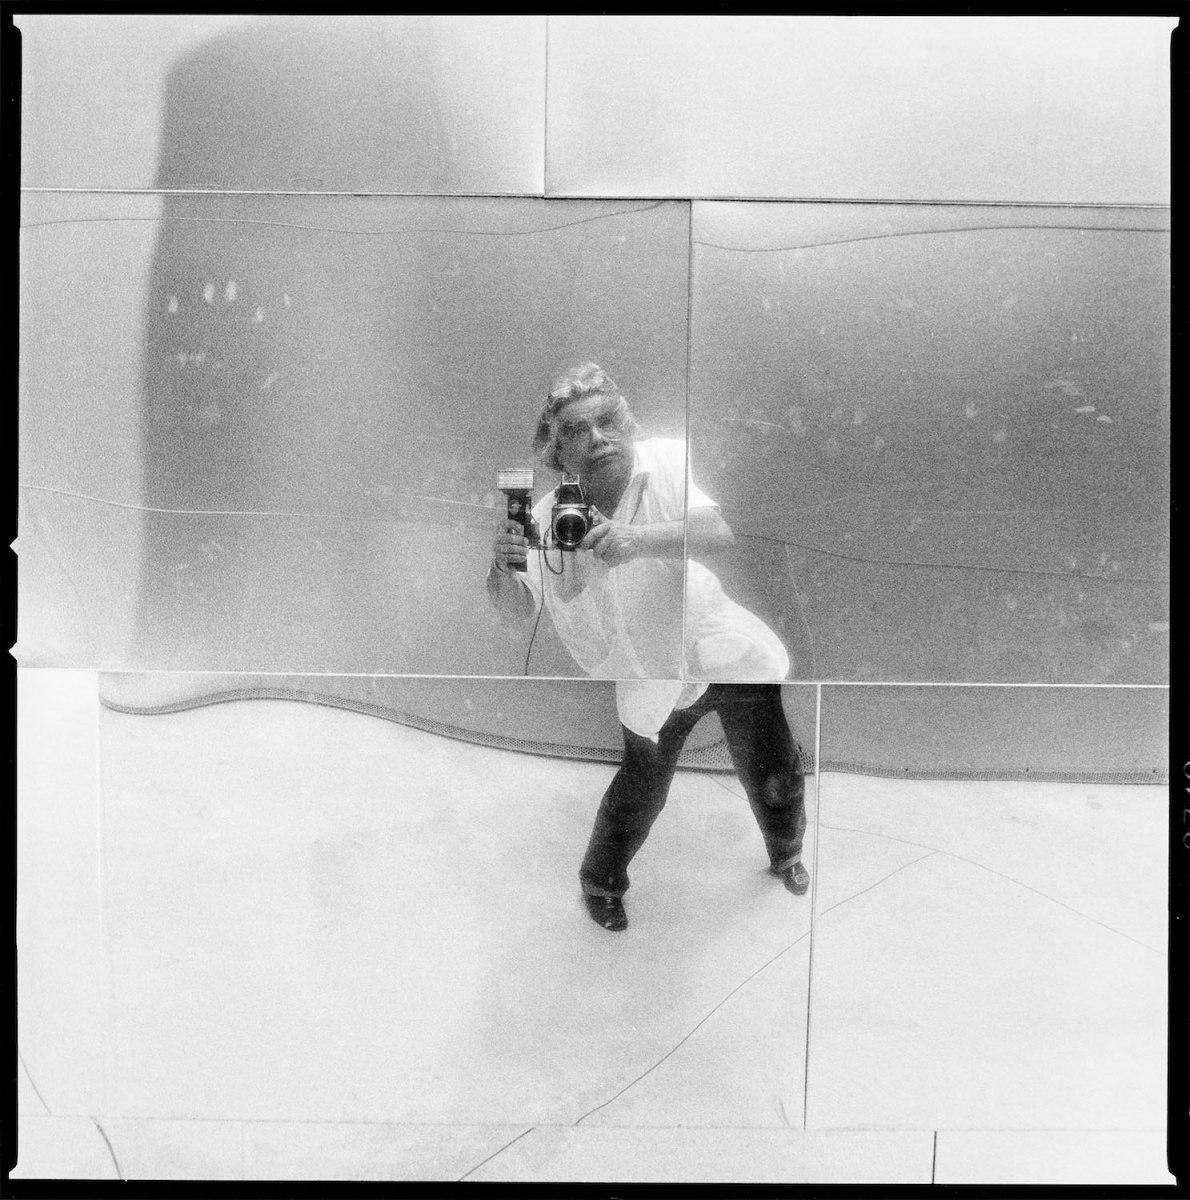 Volker Hinz in the Mirror of the Disney Concert Hall, Los Angeles 2007